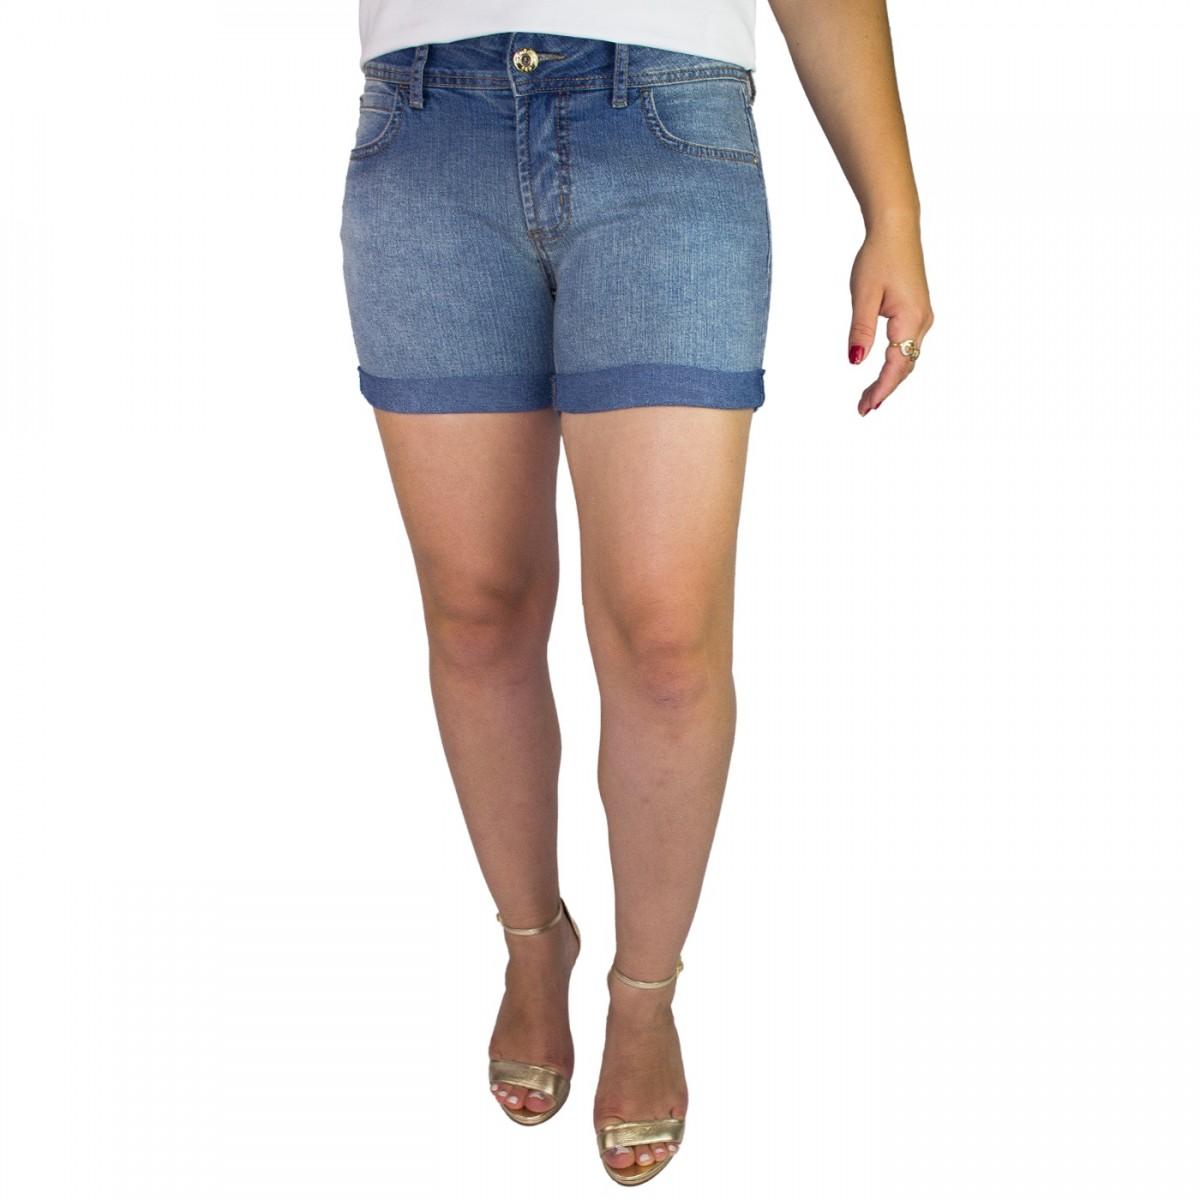 16fbee866 Bizz Store - Bermuda Jeans Juvenil Feminina Colcci Fun Indigo